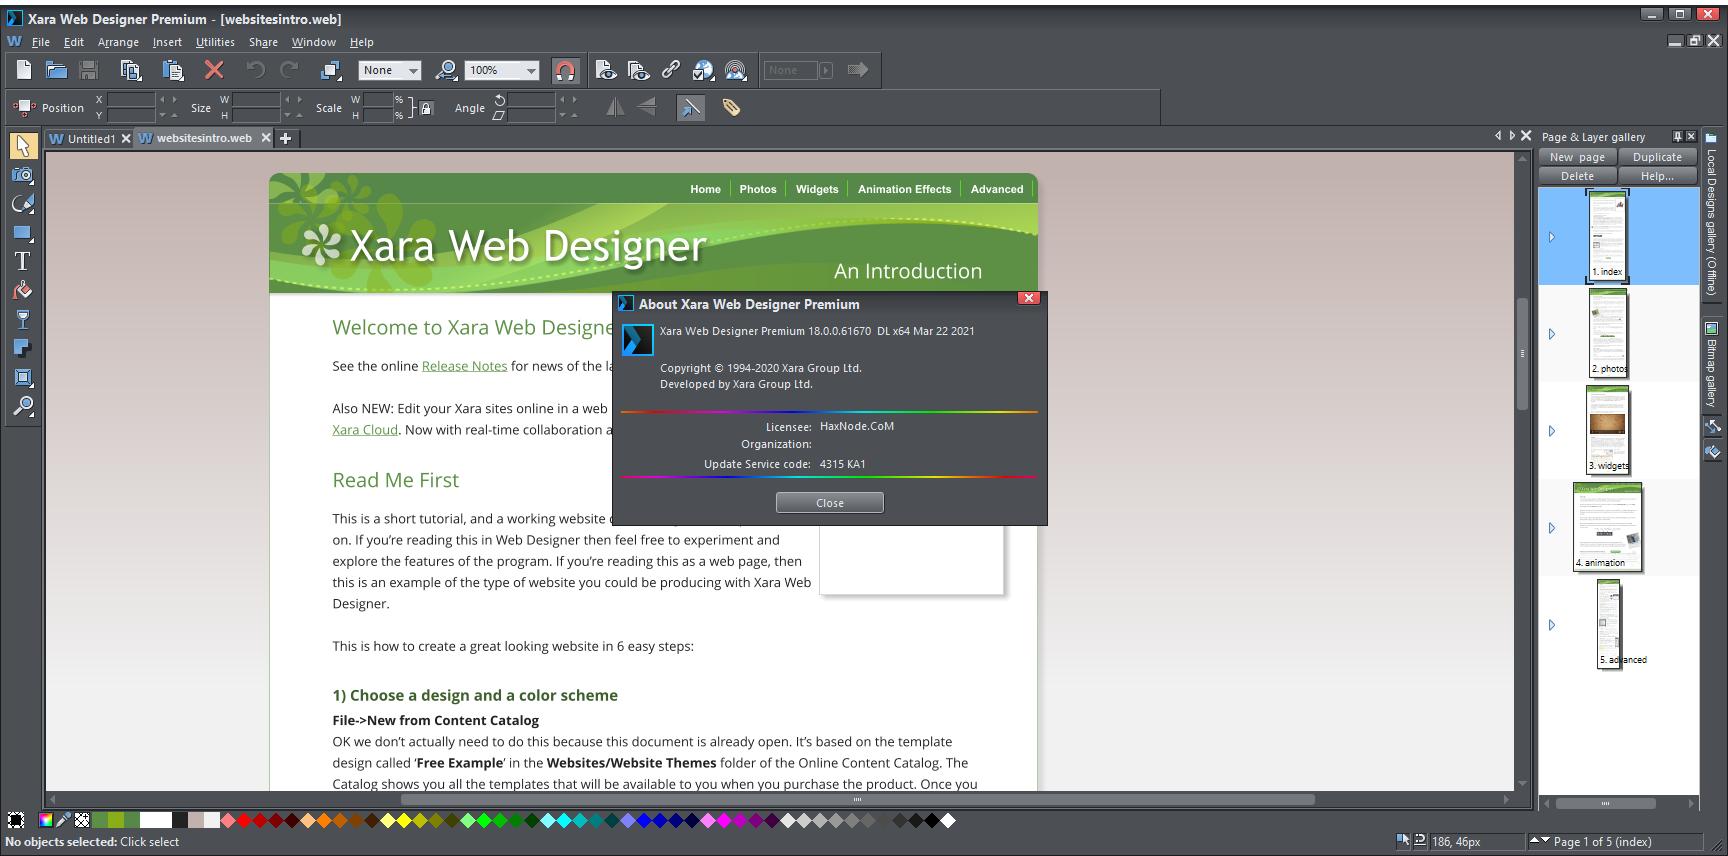 xarawebdesigner18.0.0.61670